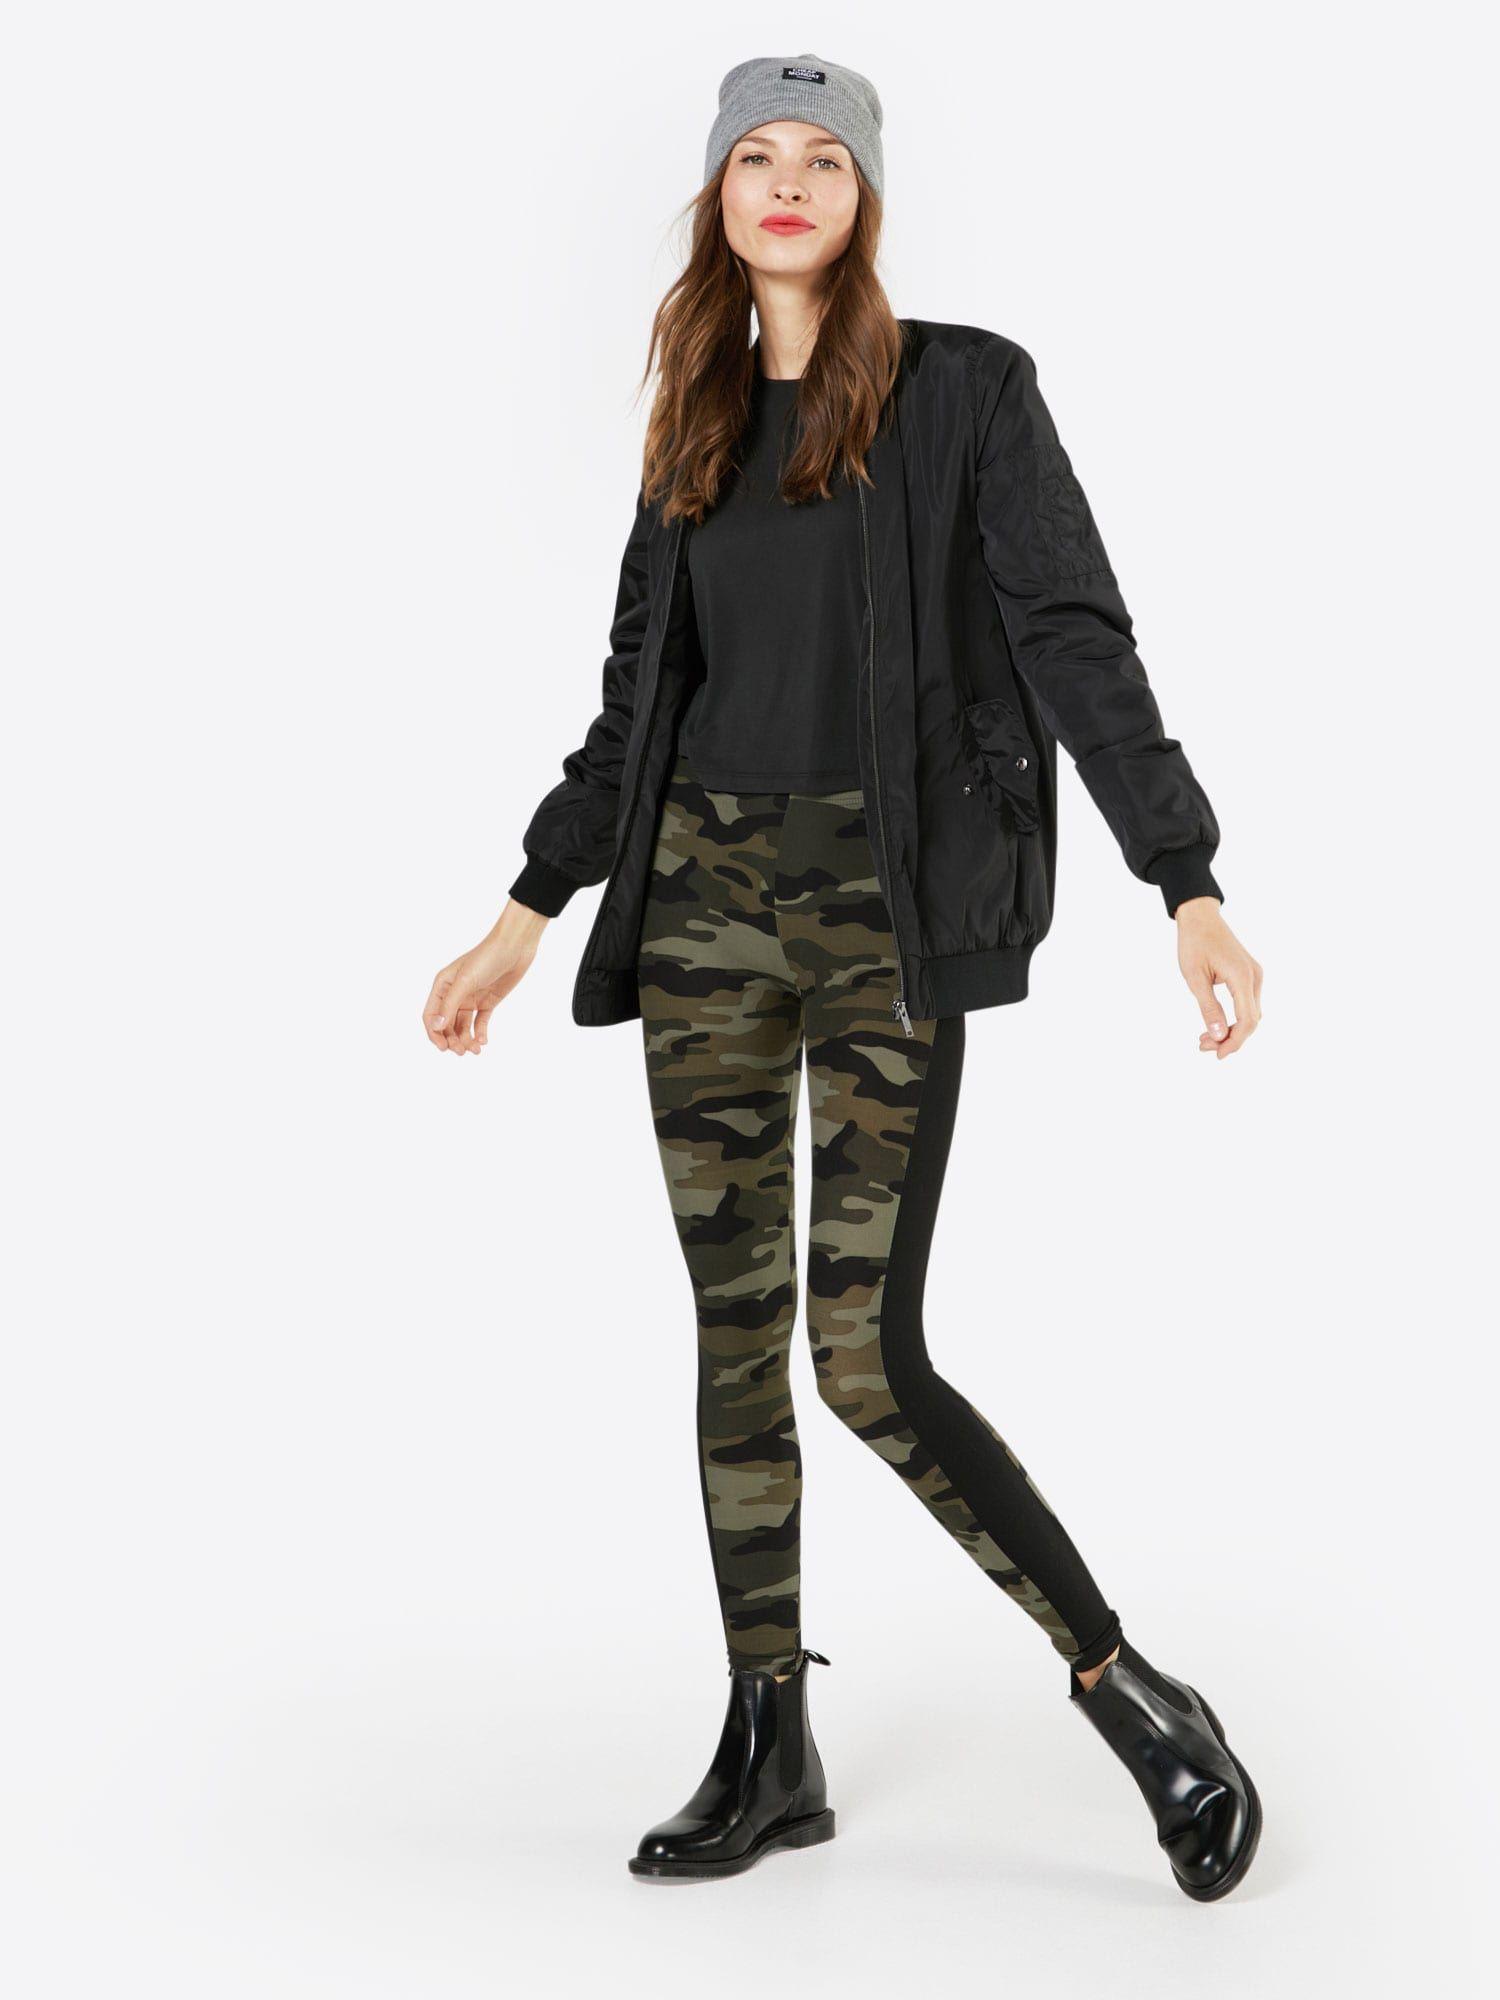 Urban Classics Leggings 'Camo Stripe' Damen, Grün / Schwarz, Größe XXXL #stripedleggings